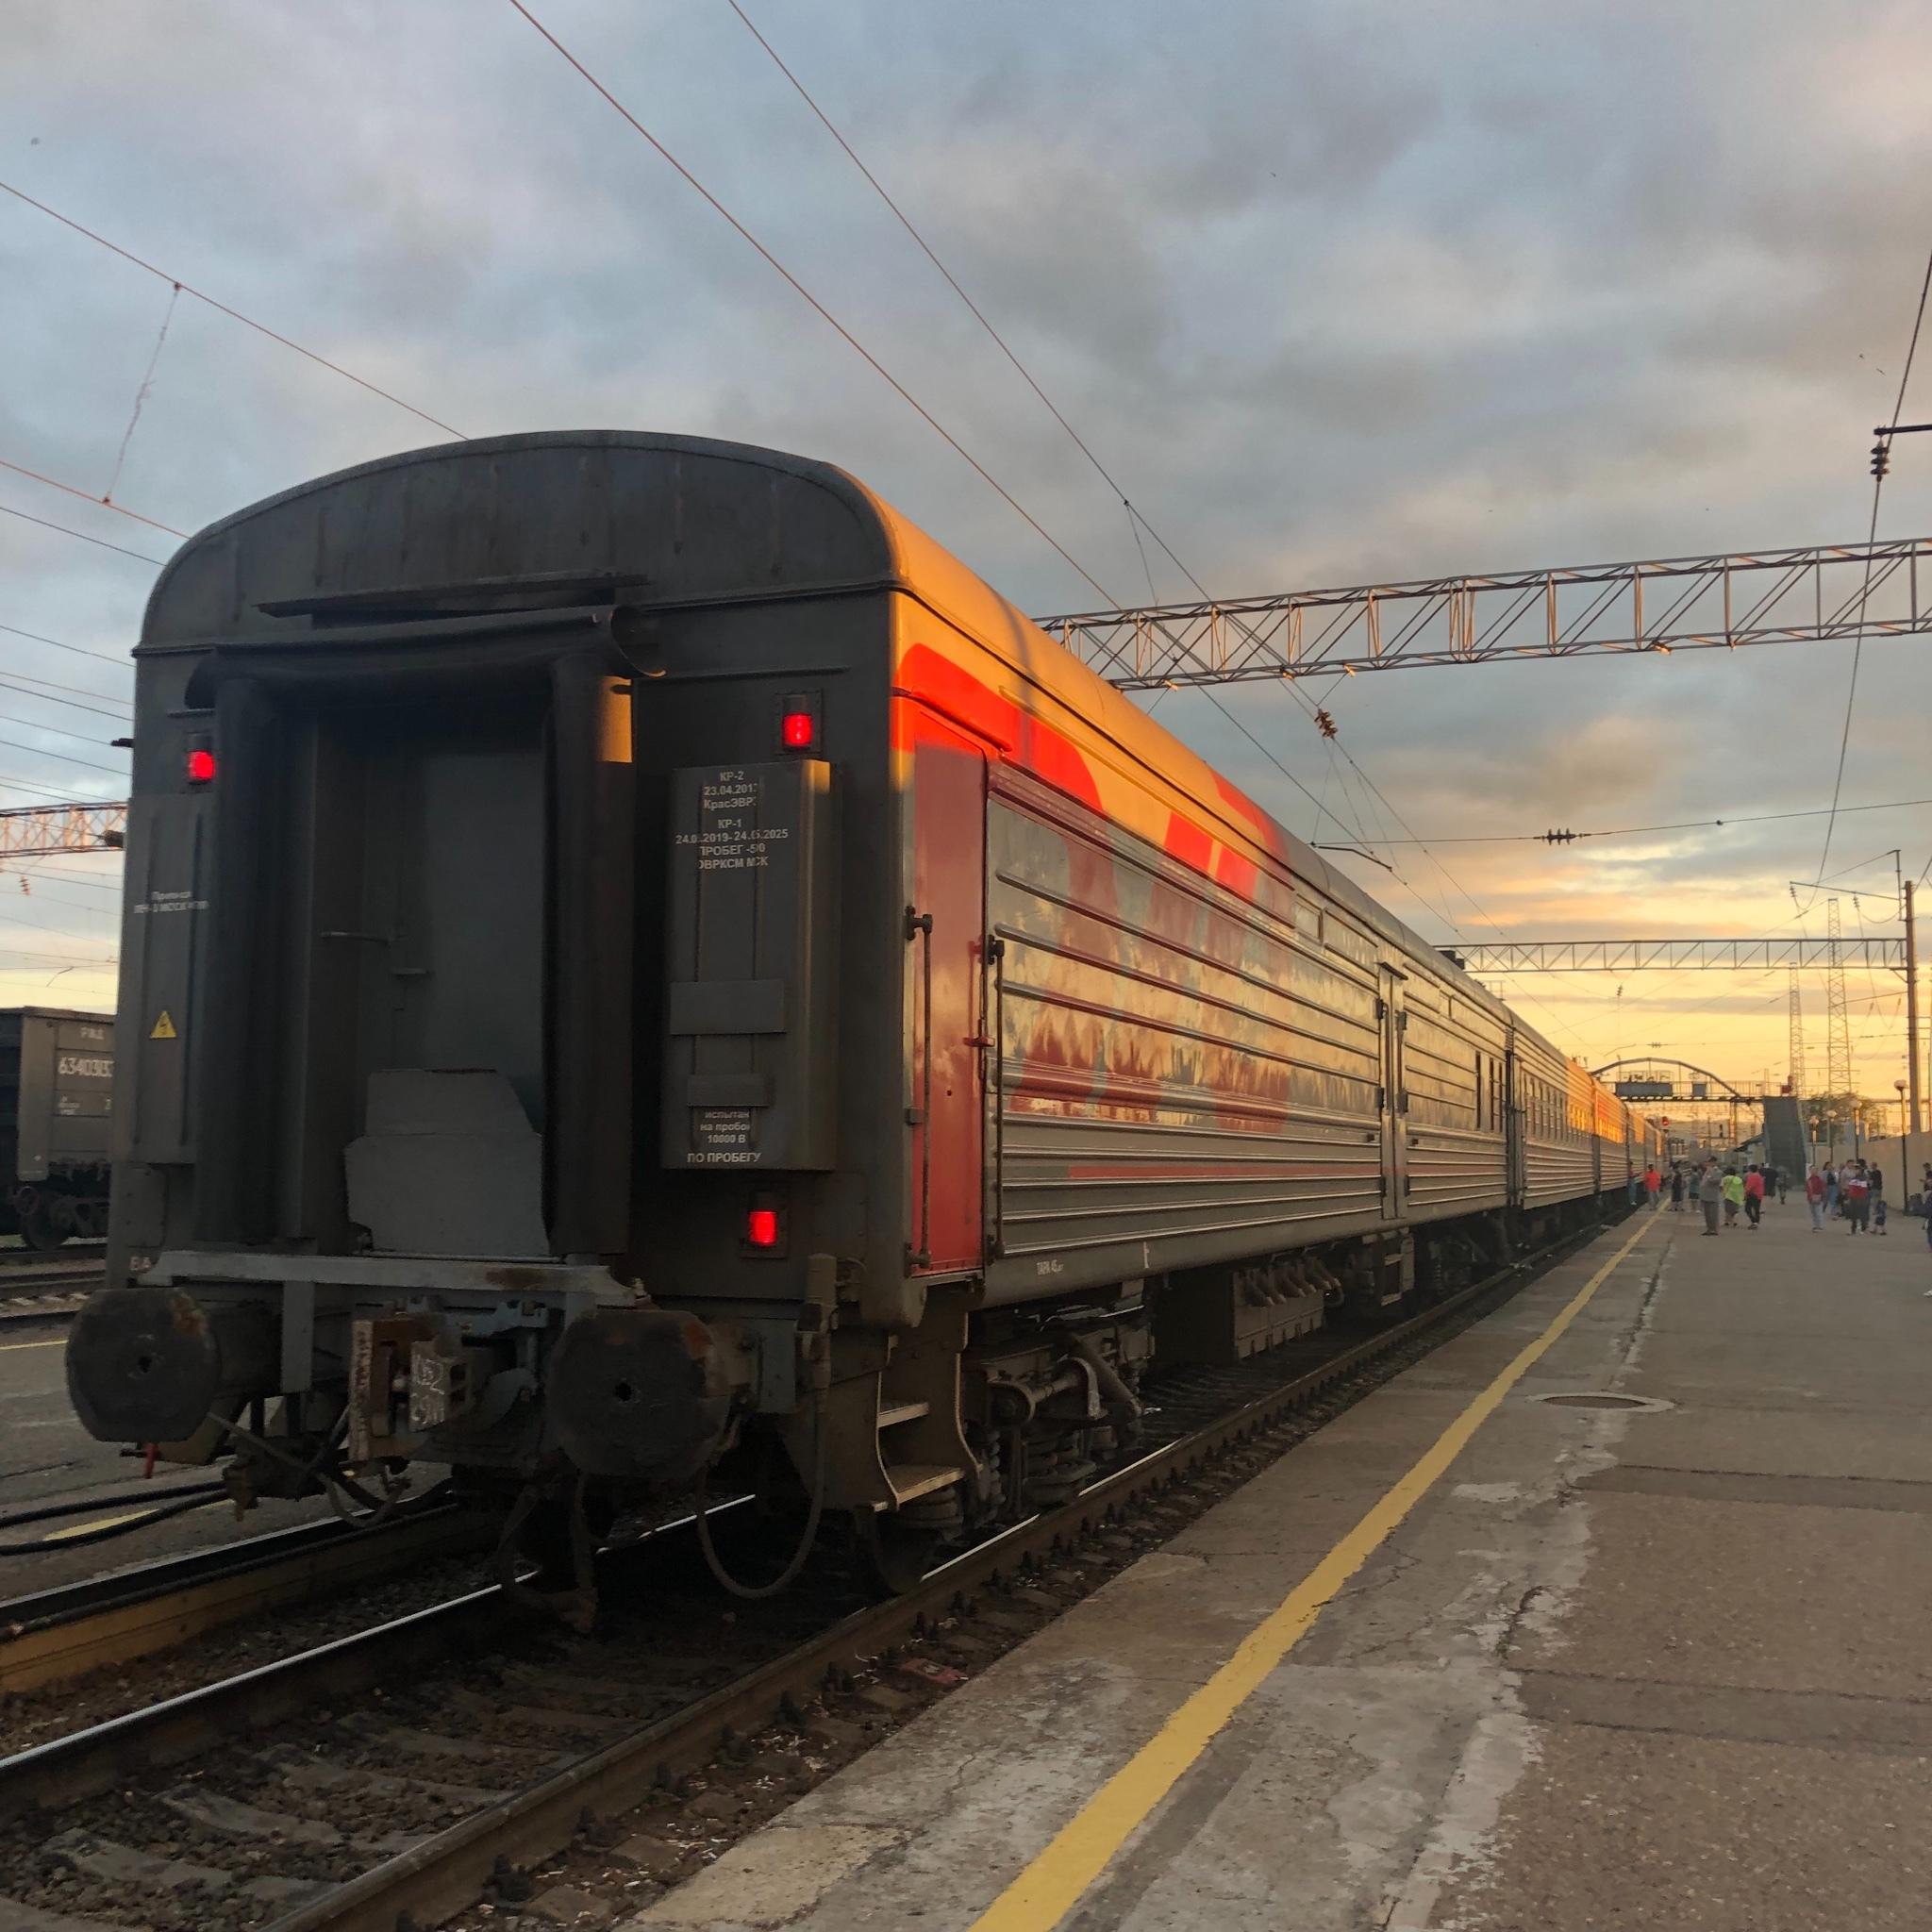 ·K19国际列车-----准备篇➕出行_游记